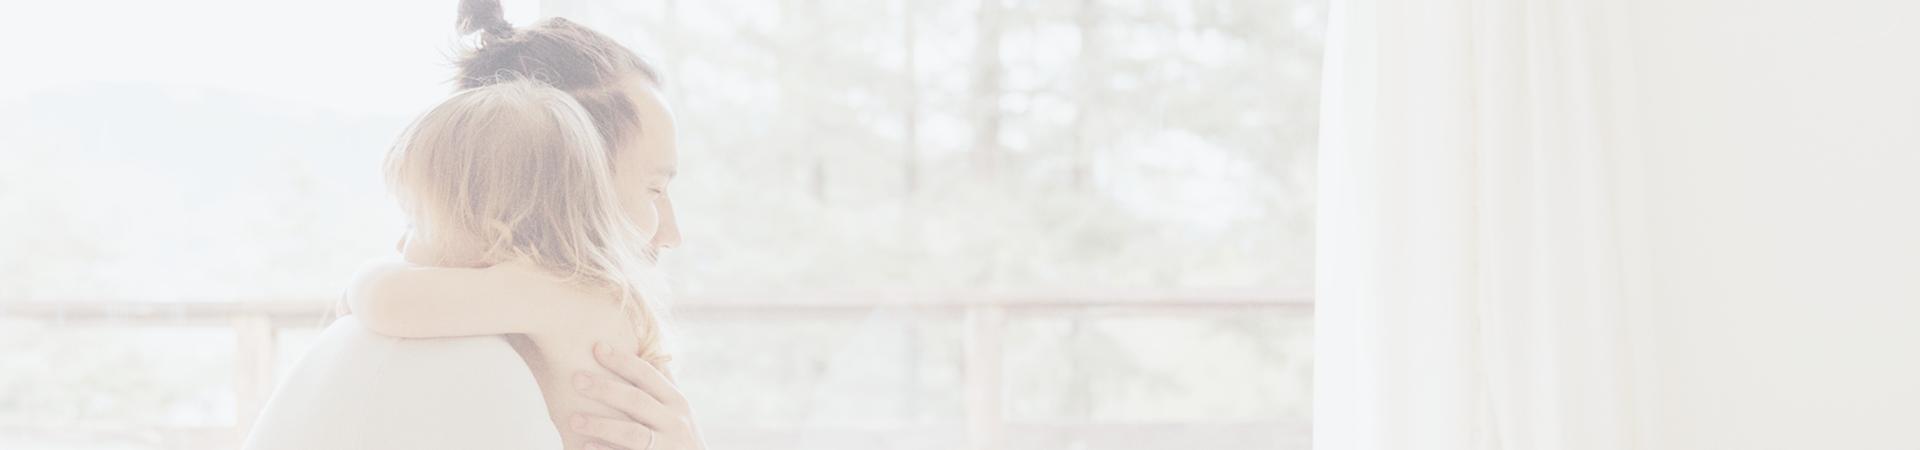 网站---舒恬系列11.png